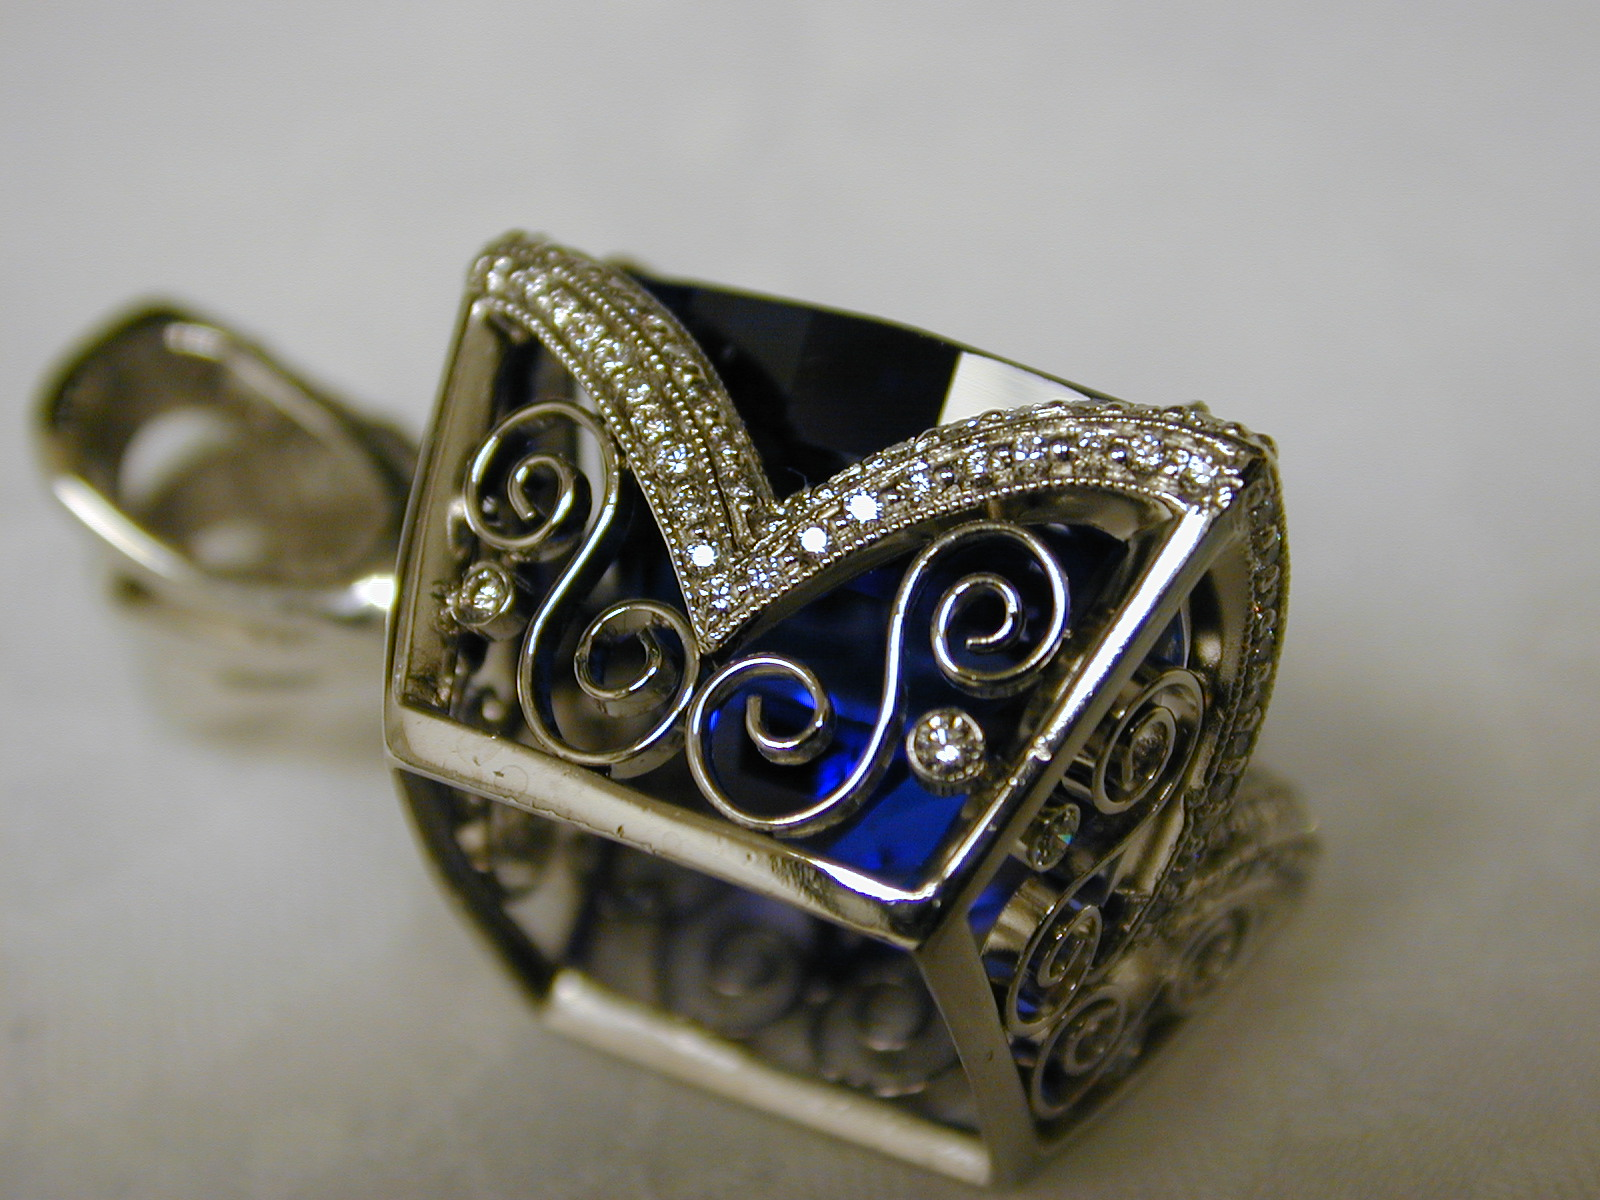 Custom Jewelry Design by Isaac Kornhauser